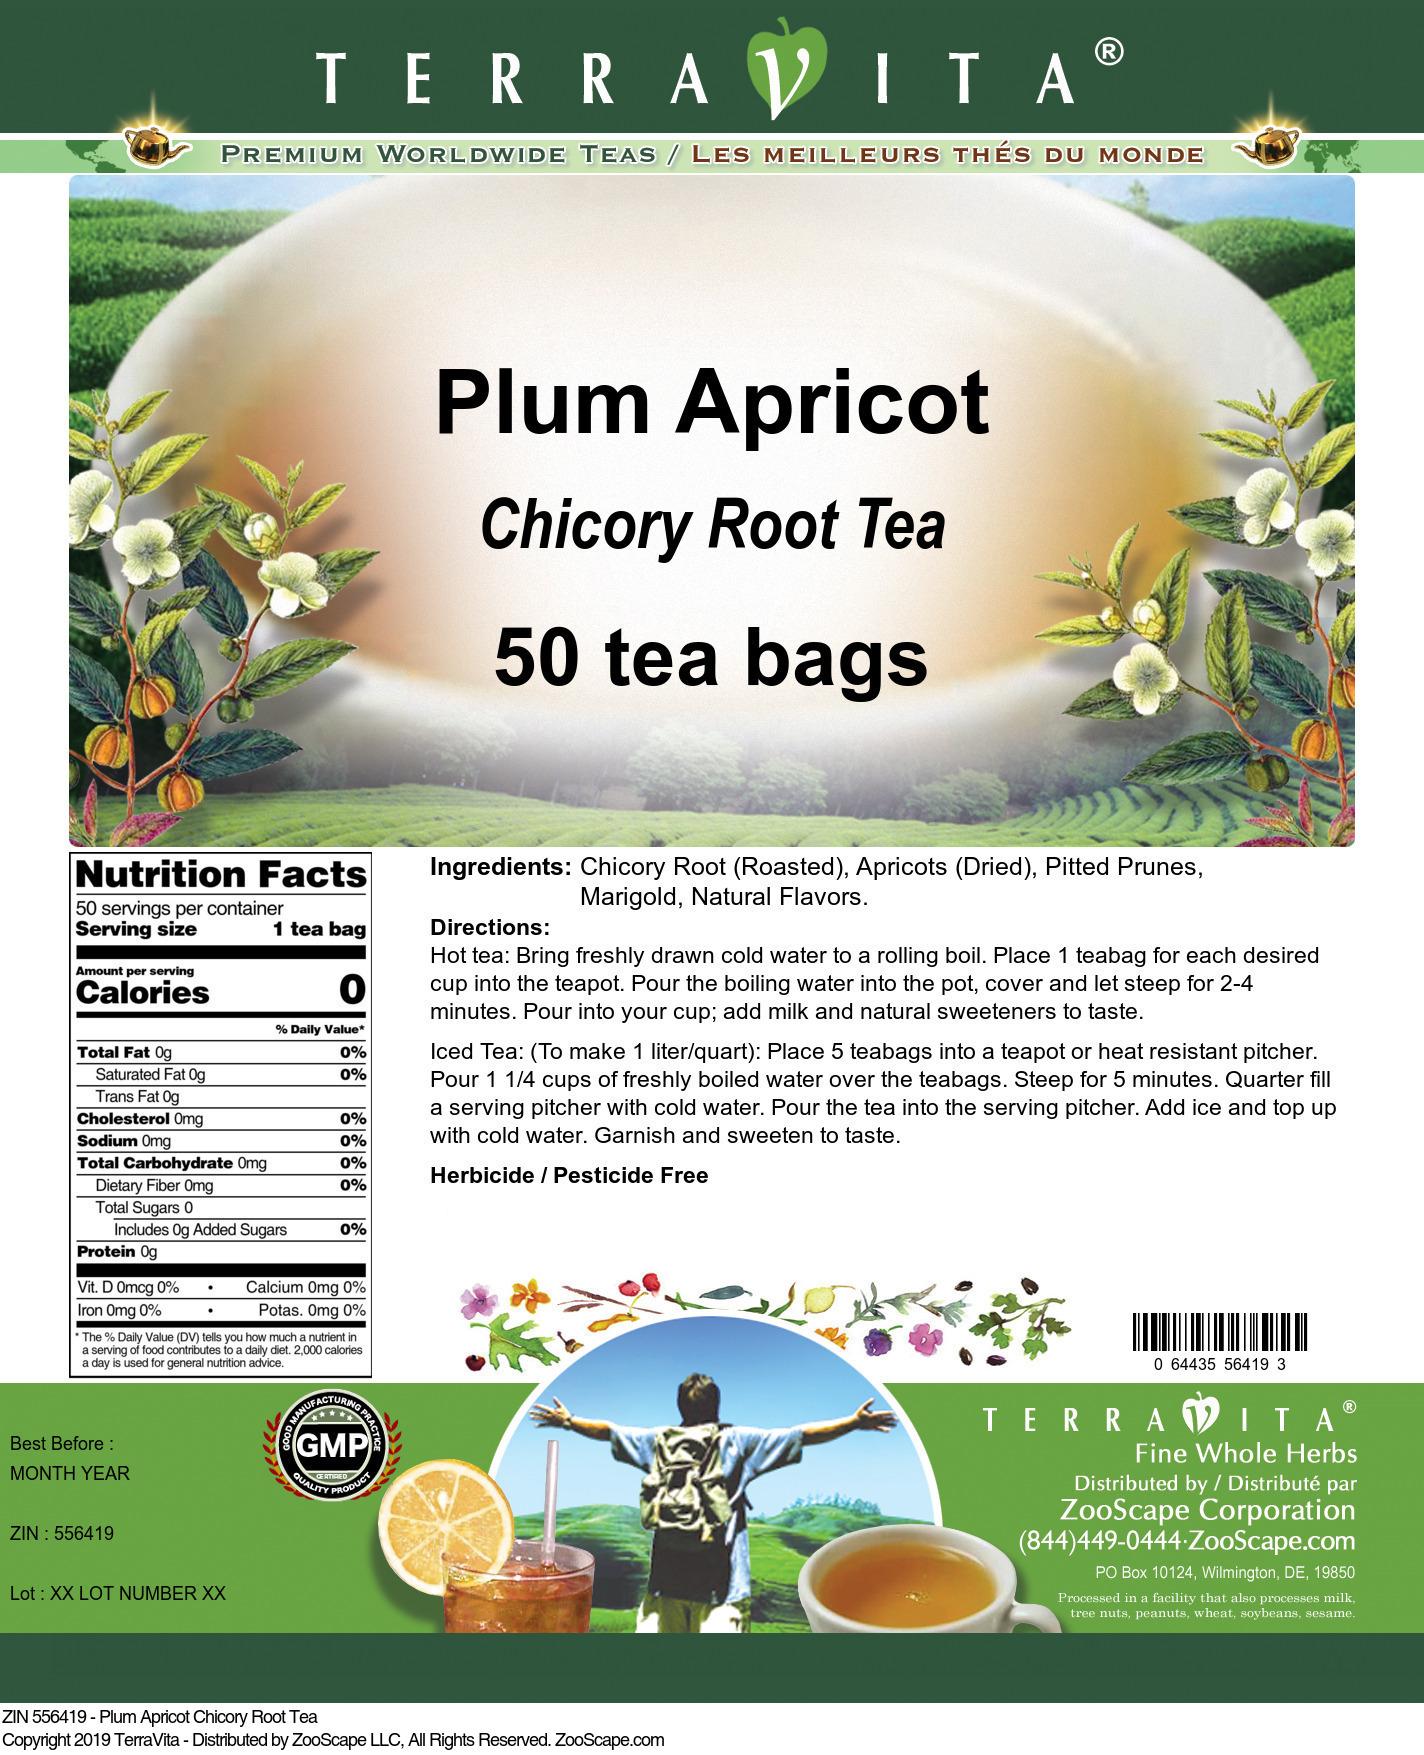 Plum Apricot Chicory Root Tea